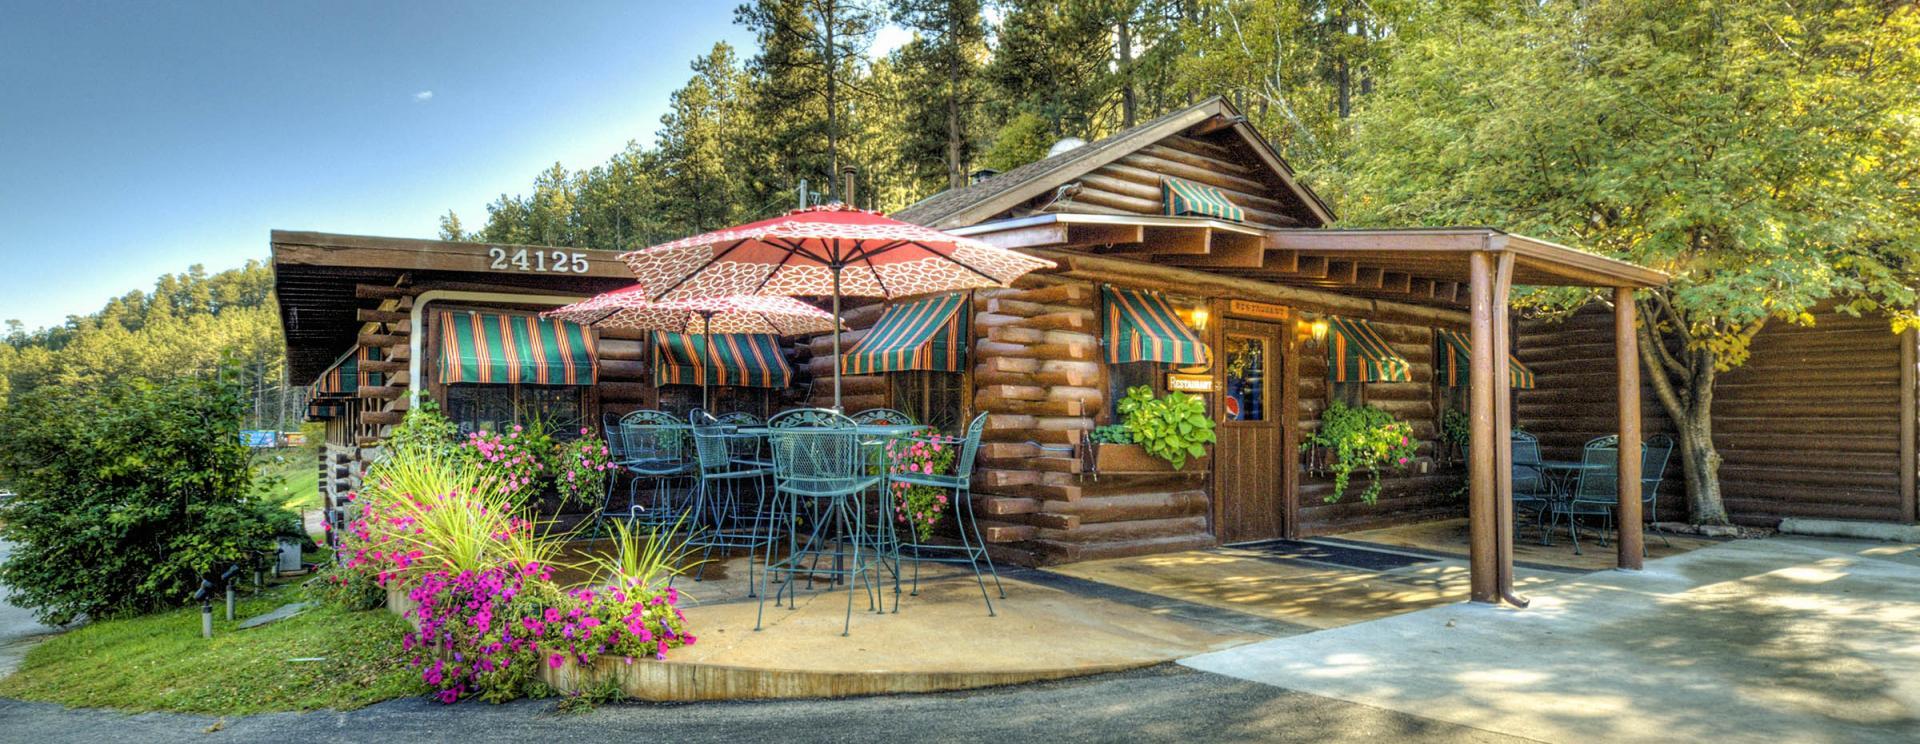 Powder House Lodge Restaurant